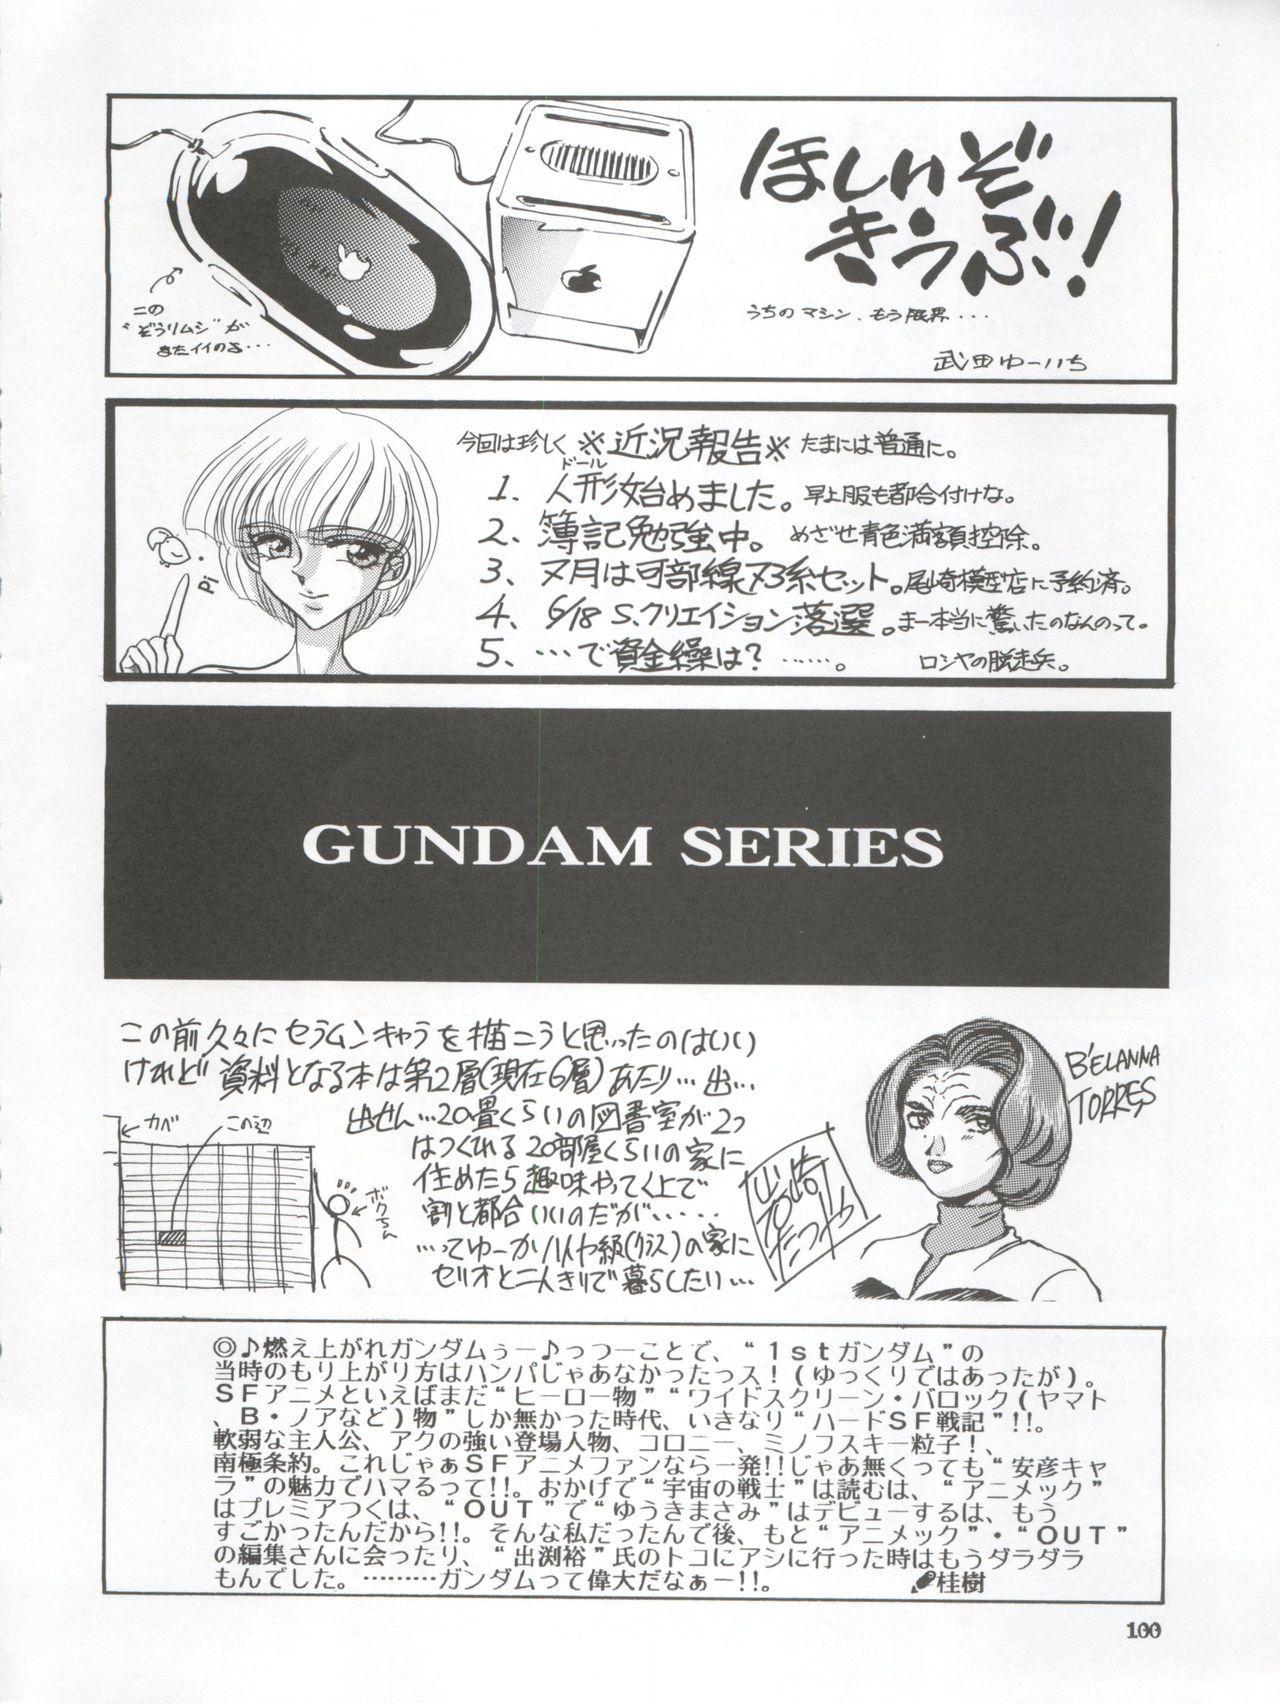 NEXT Climax Magazine 3 Gundam Series 99